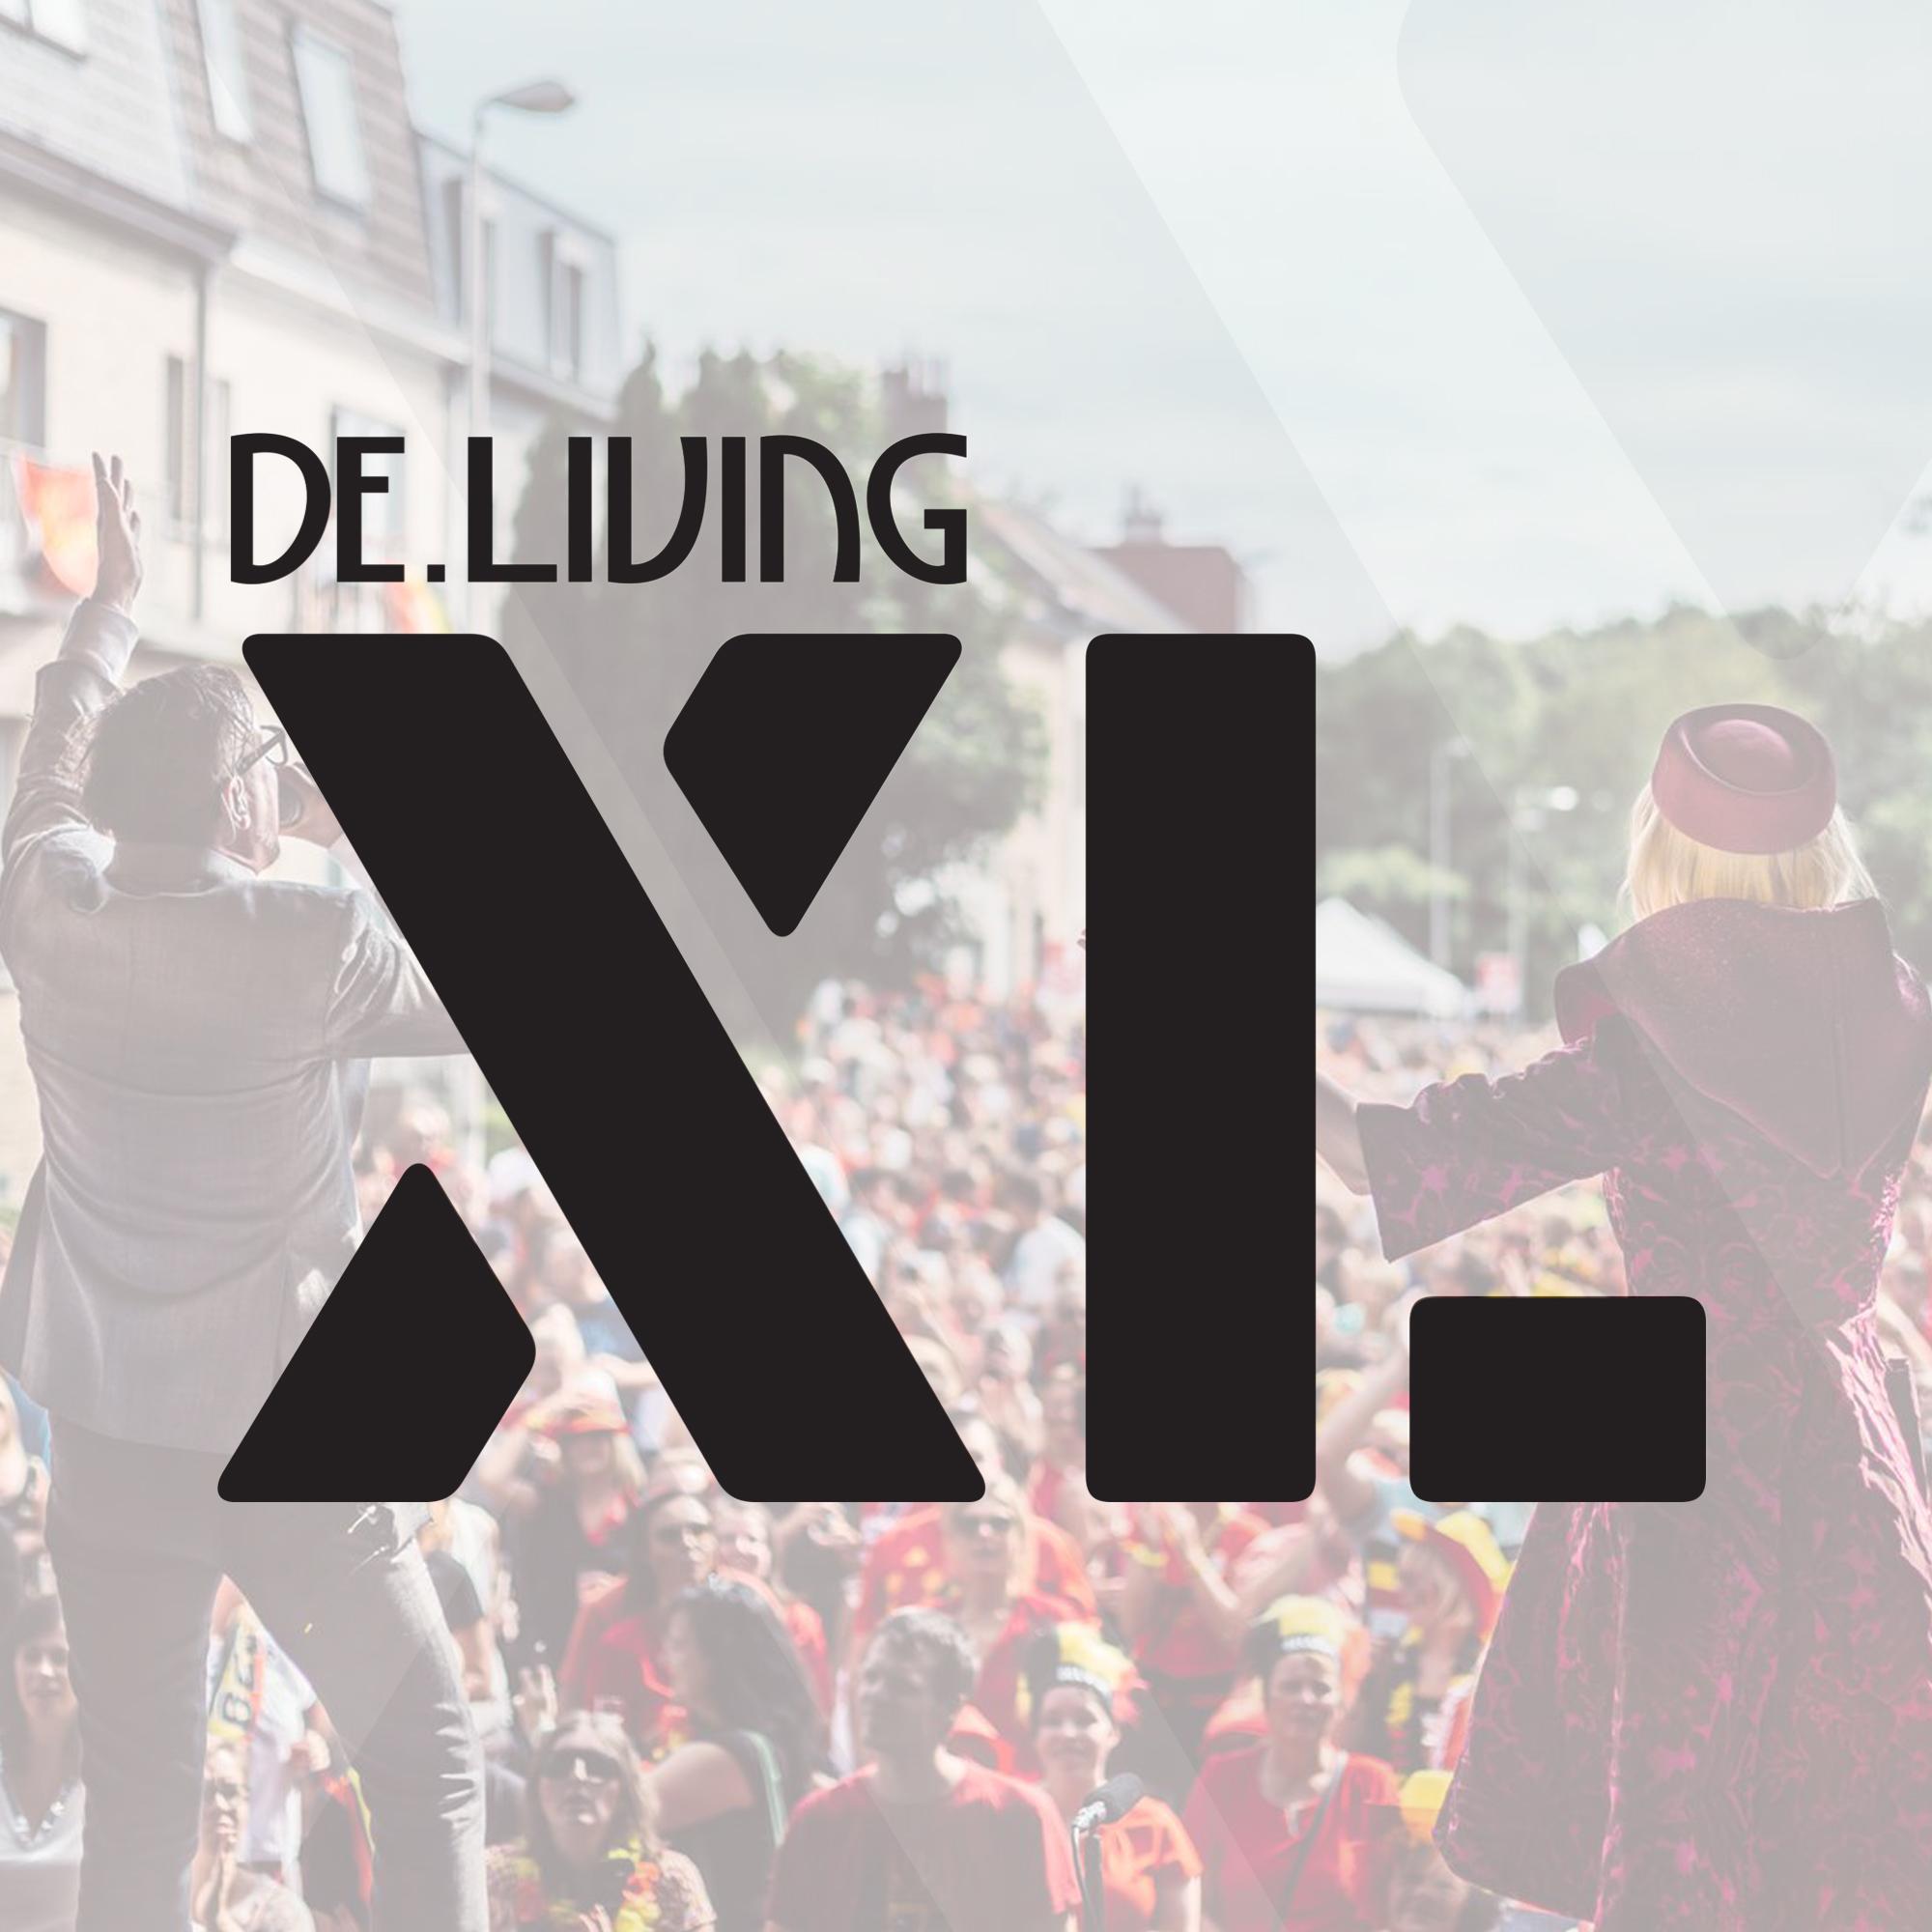 De.Living XL 2019 teaserimage